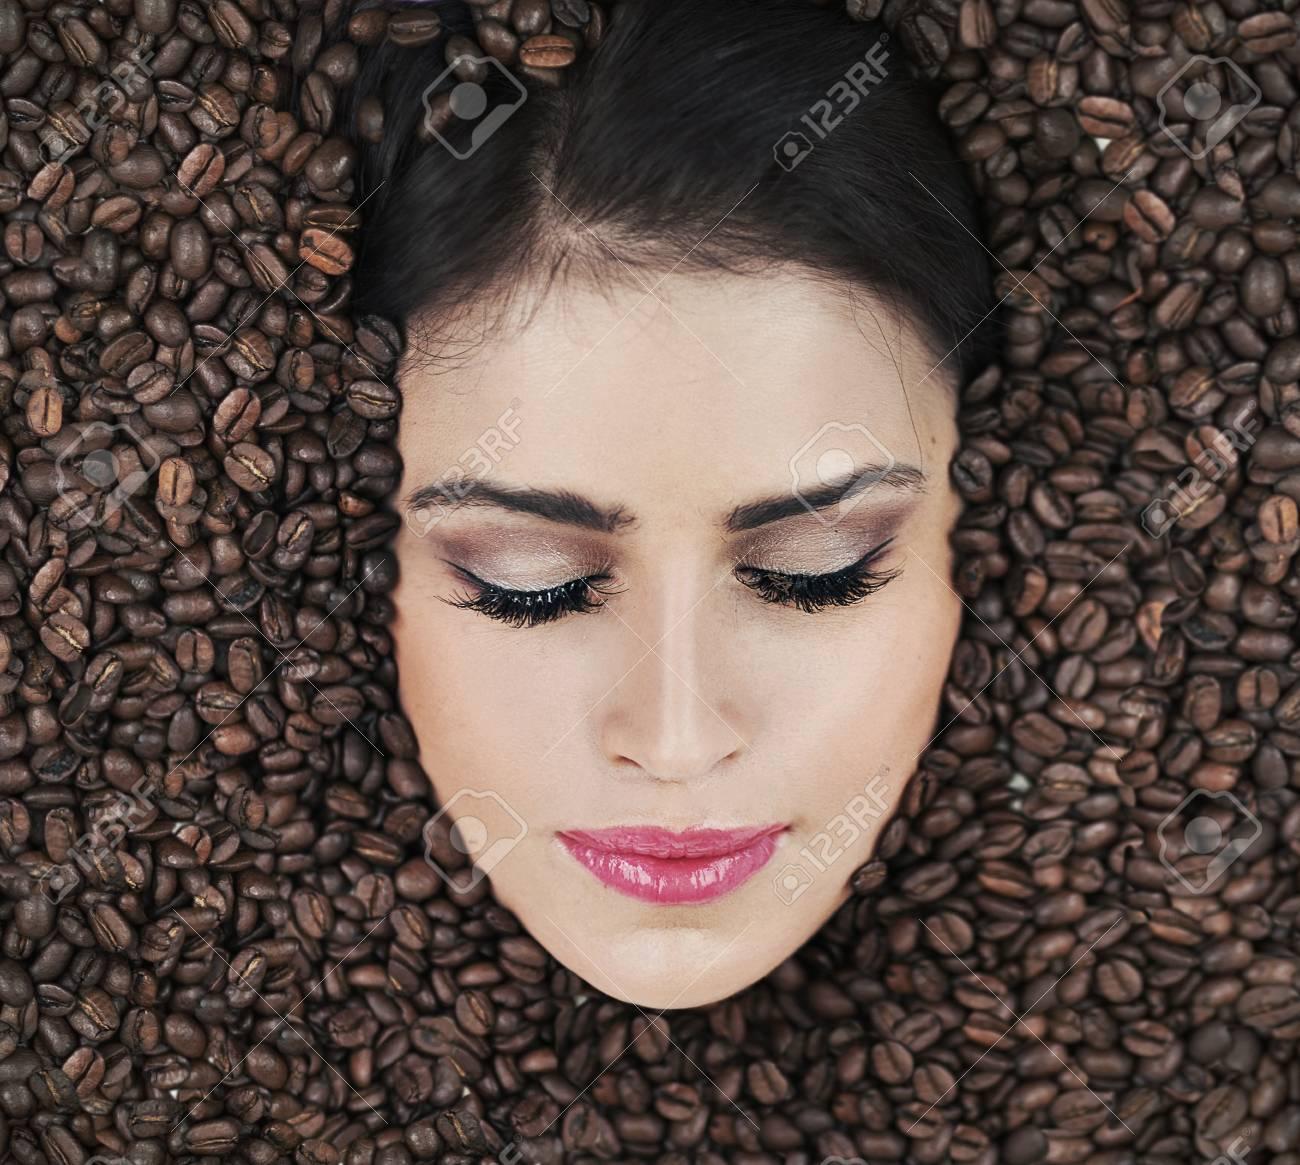 Beautiful face among coffee beans Stock Photo - 15865179